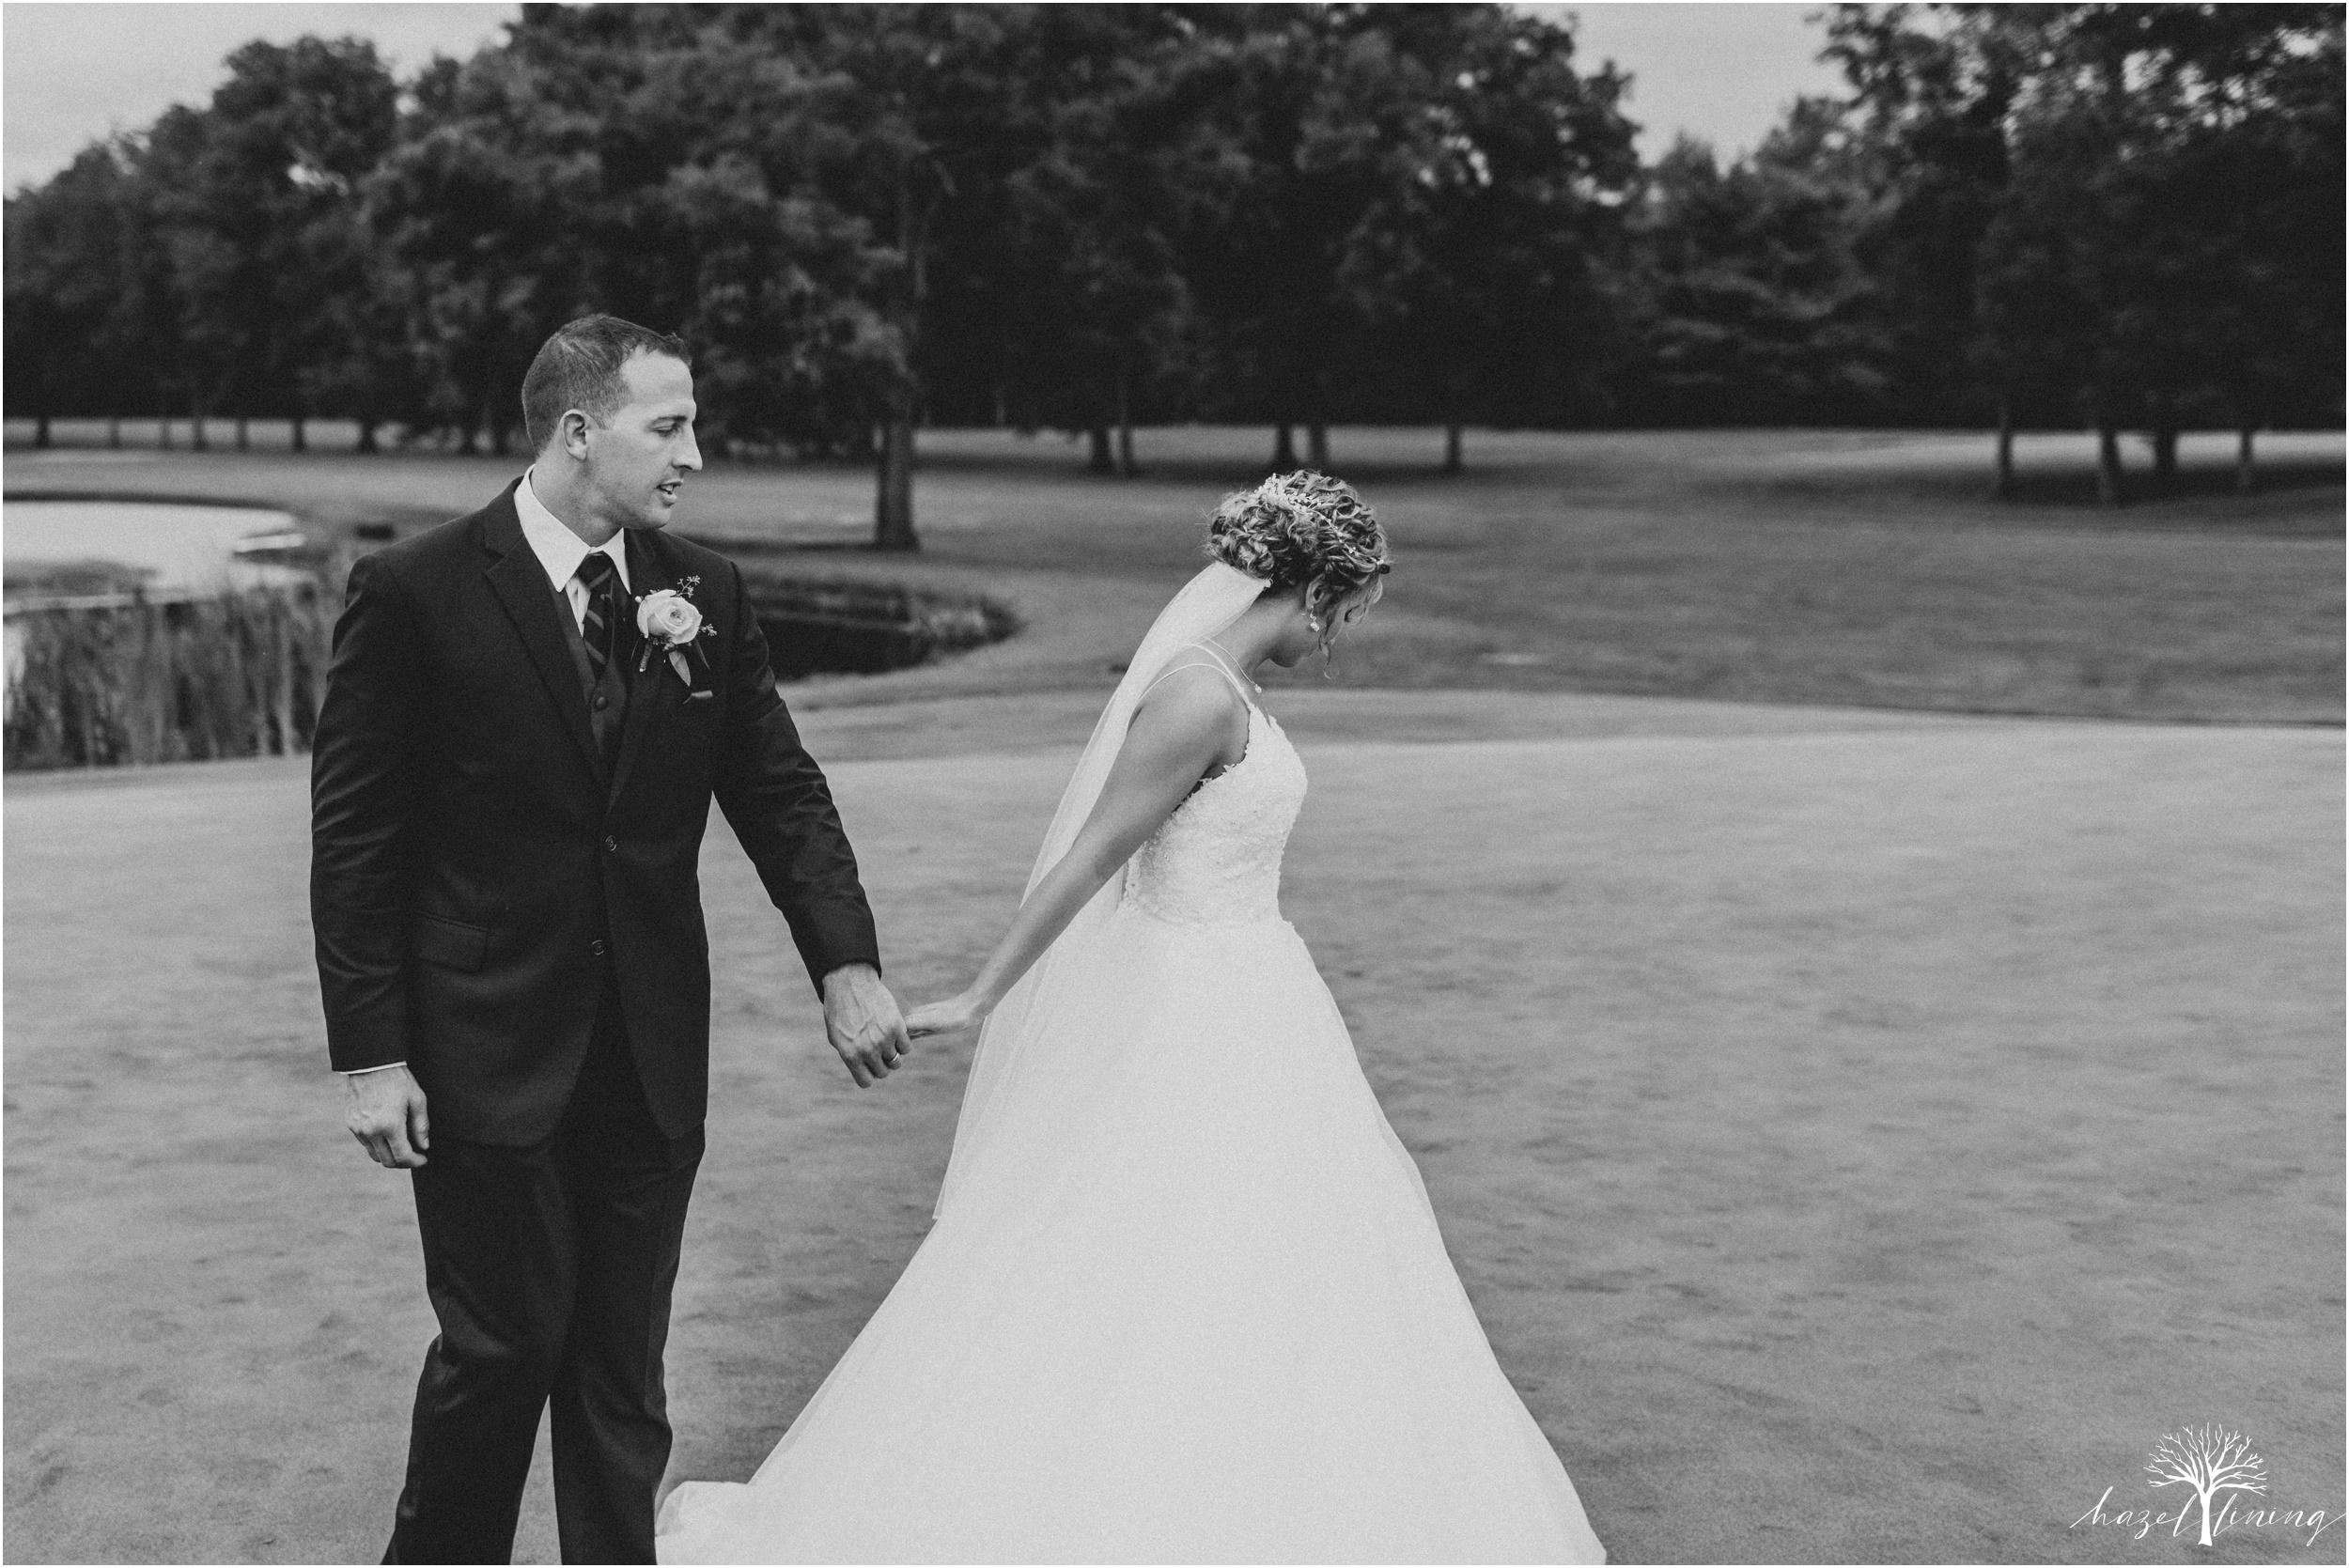 jonathan-weibel-becky-haywood-loft-at-sweetwater-cc-pennsburg-pennsylvania-rainy-day-summer-wedding-hazel-lining-travel-wedding-elopement-photography_0084.jpg